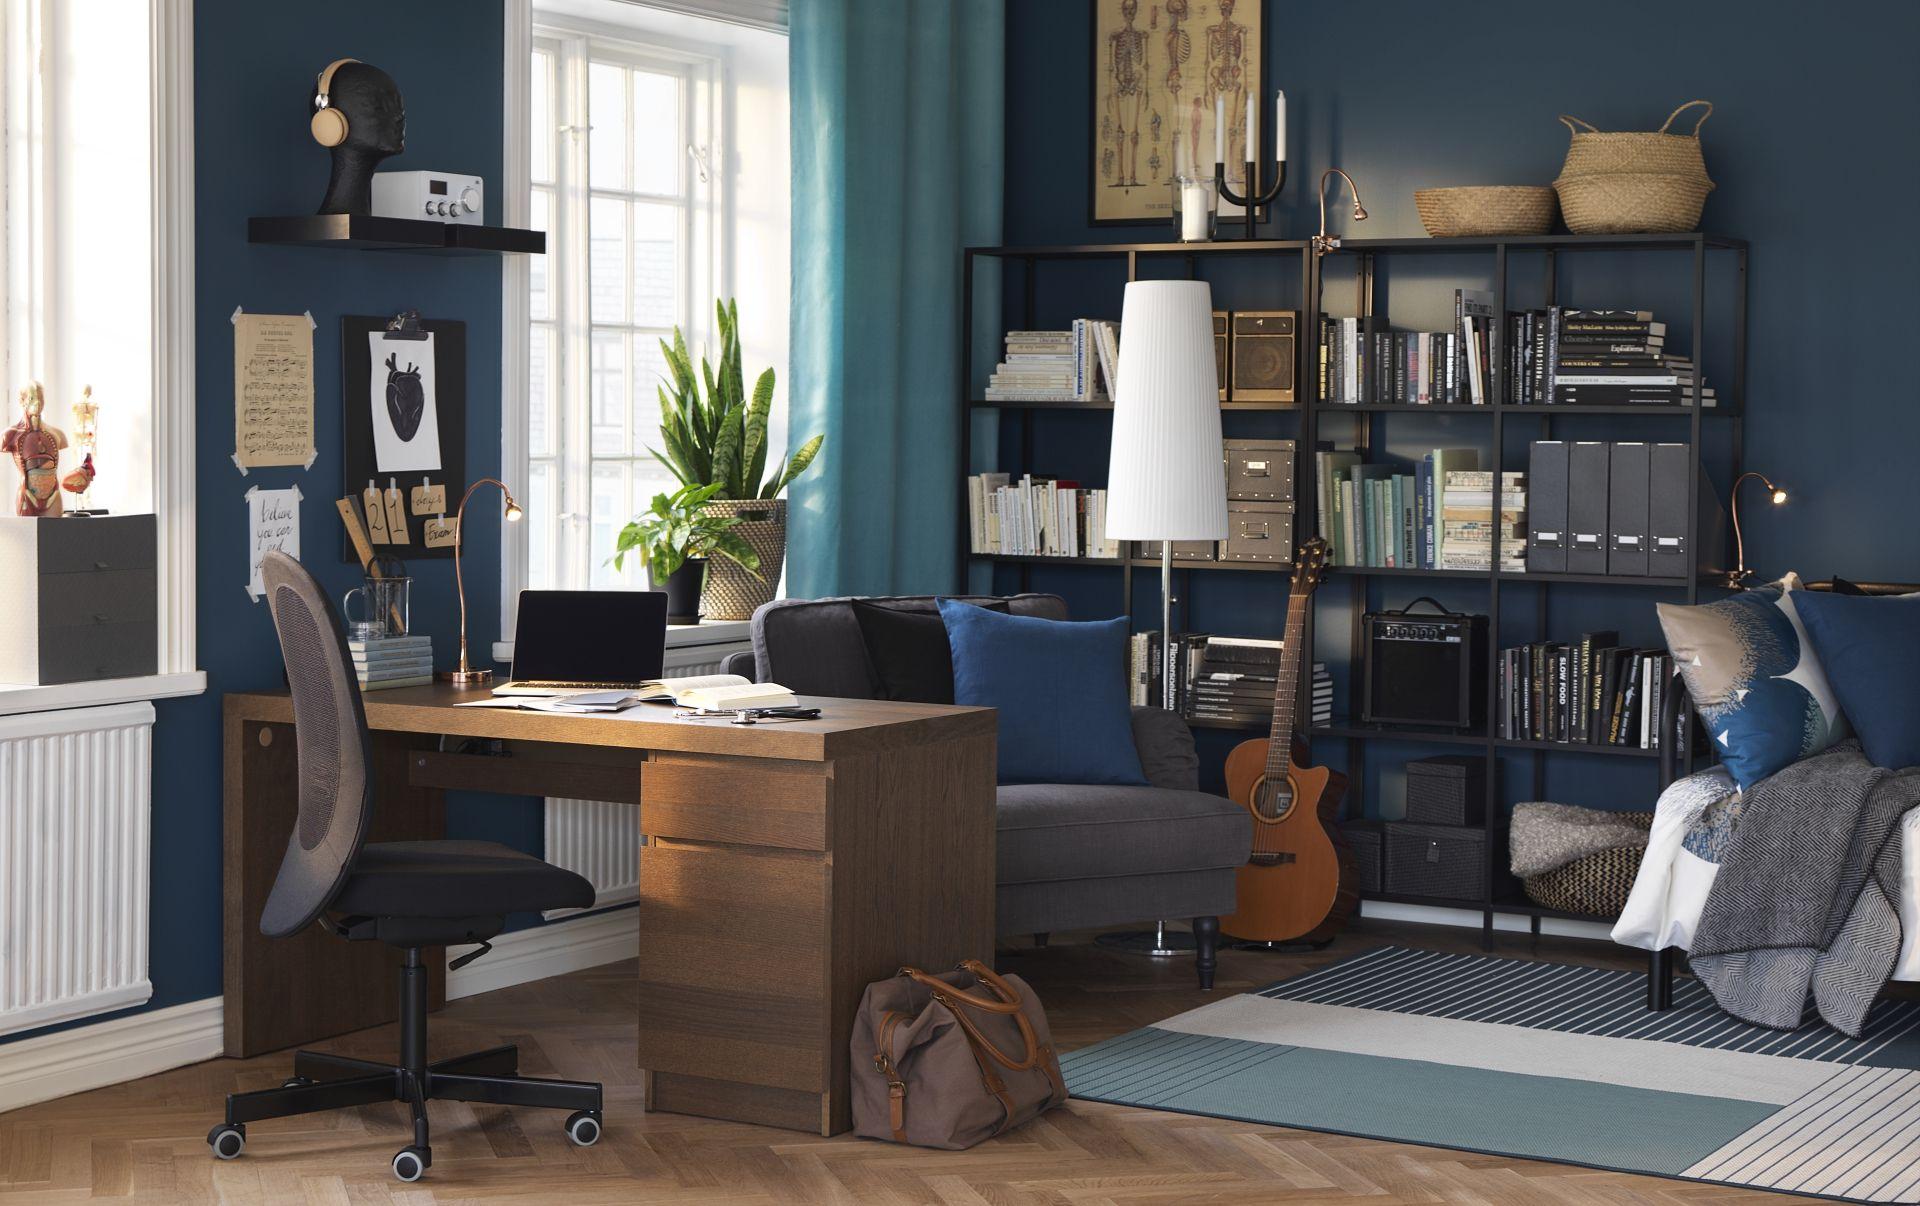 Malm bureau wit werkplekken bureau ikea malm and